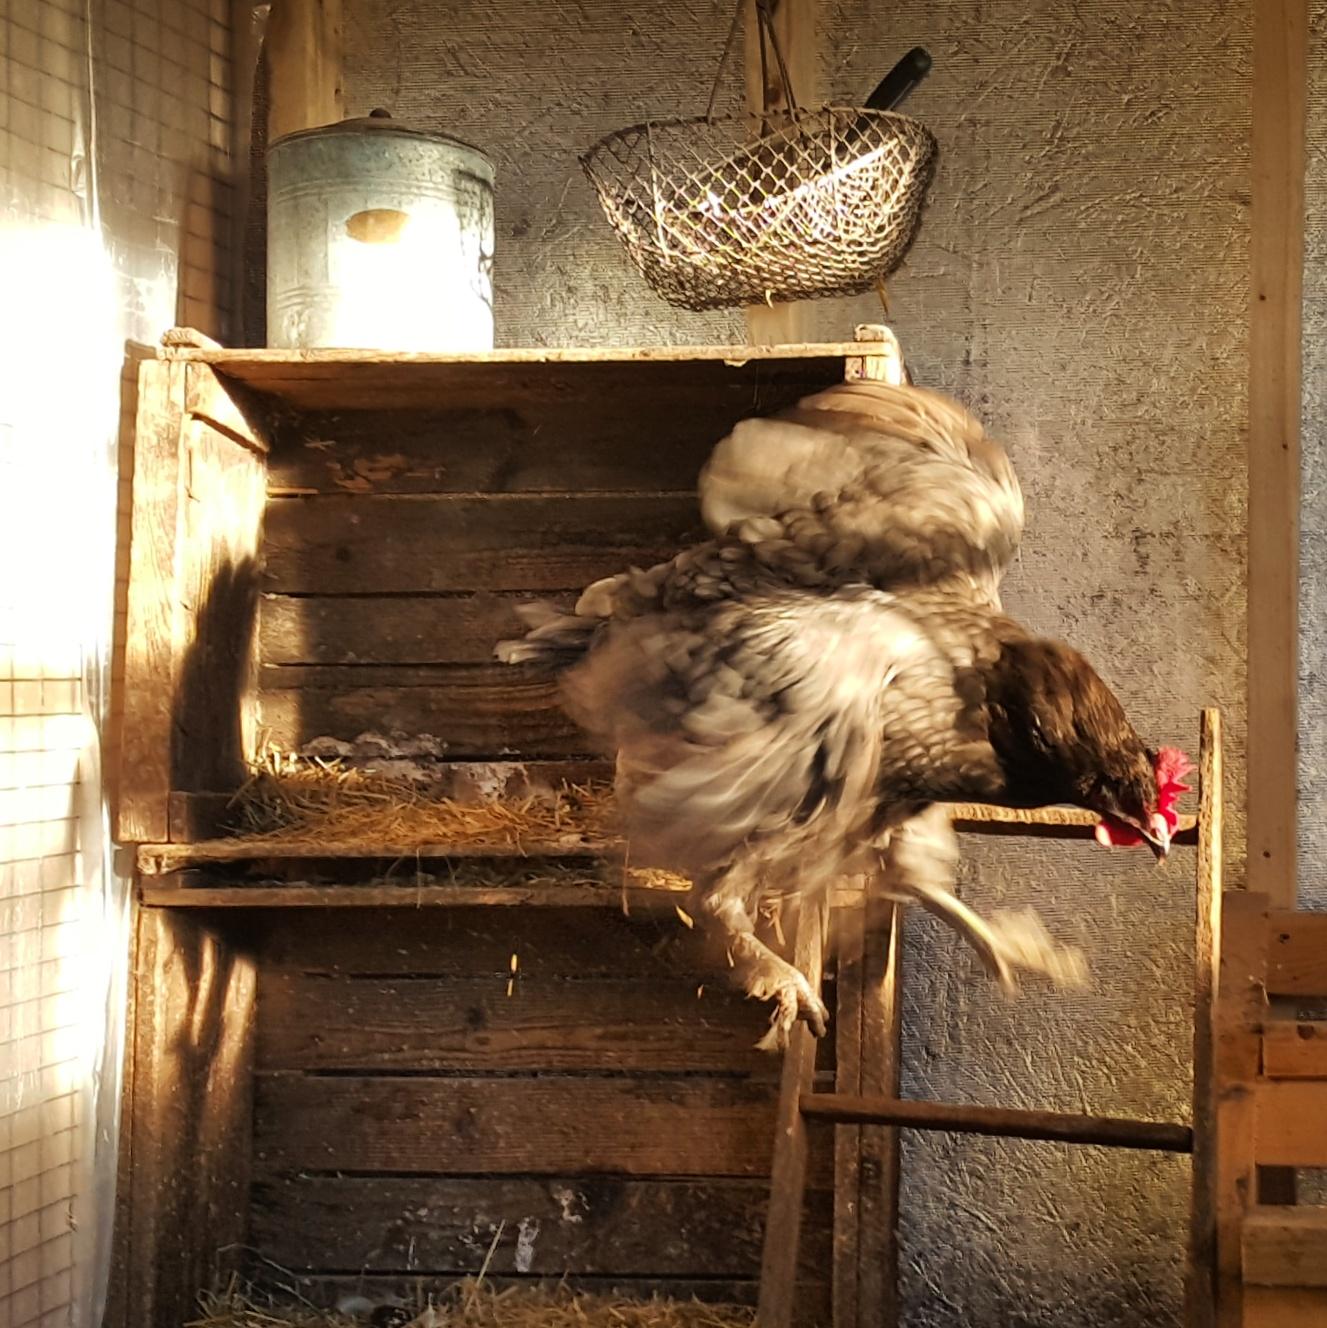 The Case Against Adding Supplemental Winter Chicken Coop Light ...